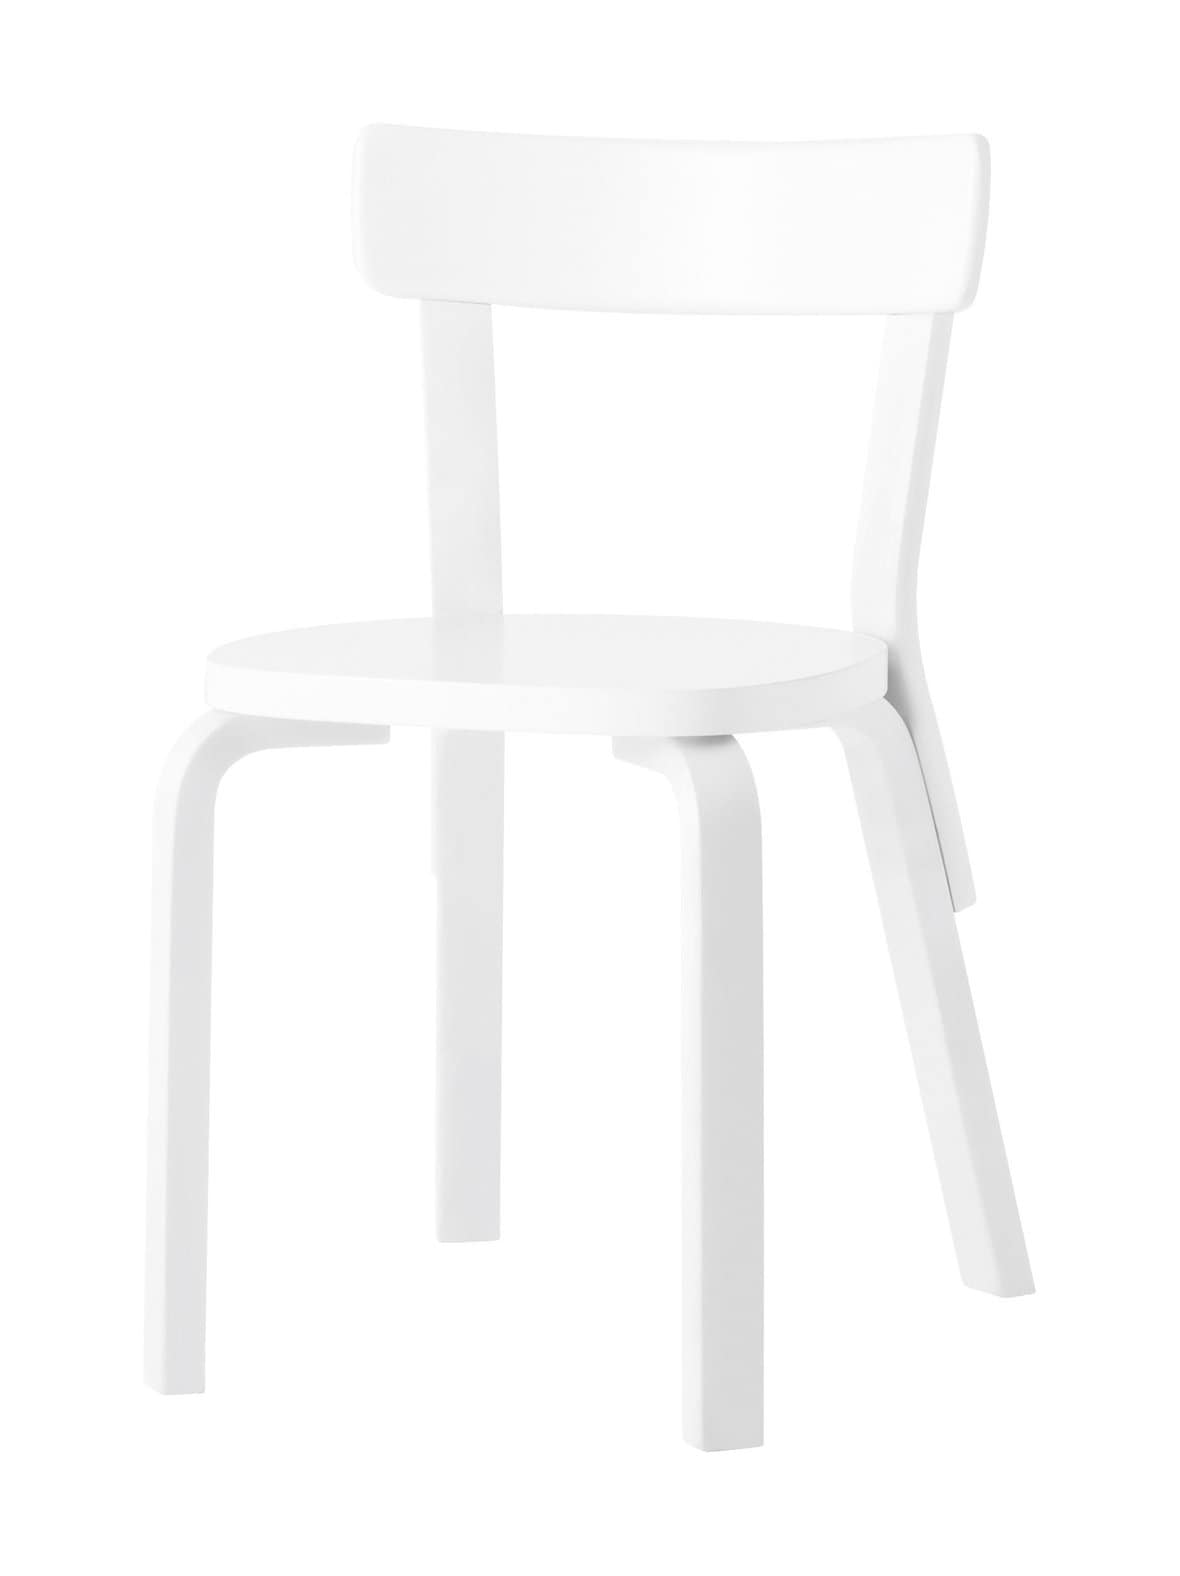 69 tuoli, koottu, Artek